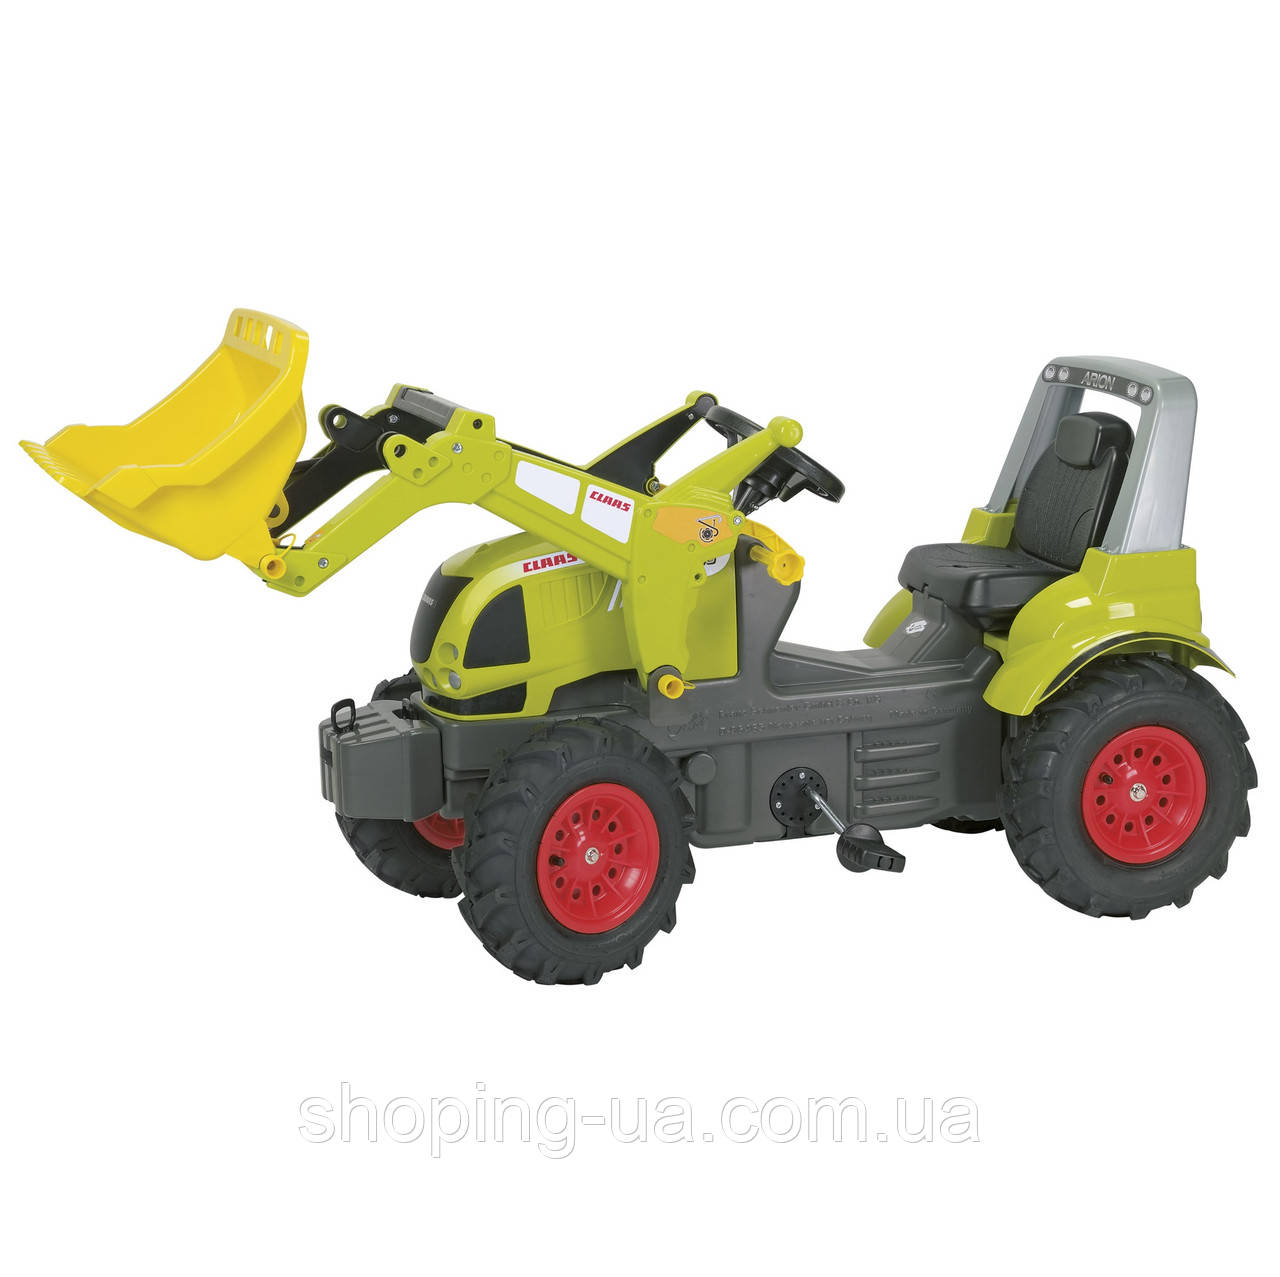 Педальный трактор rollyFarmtrac Claas Arion Rolly Toys 710249